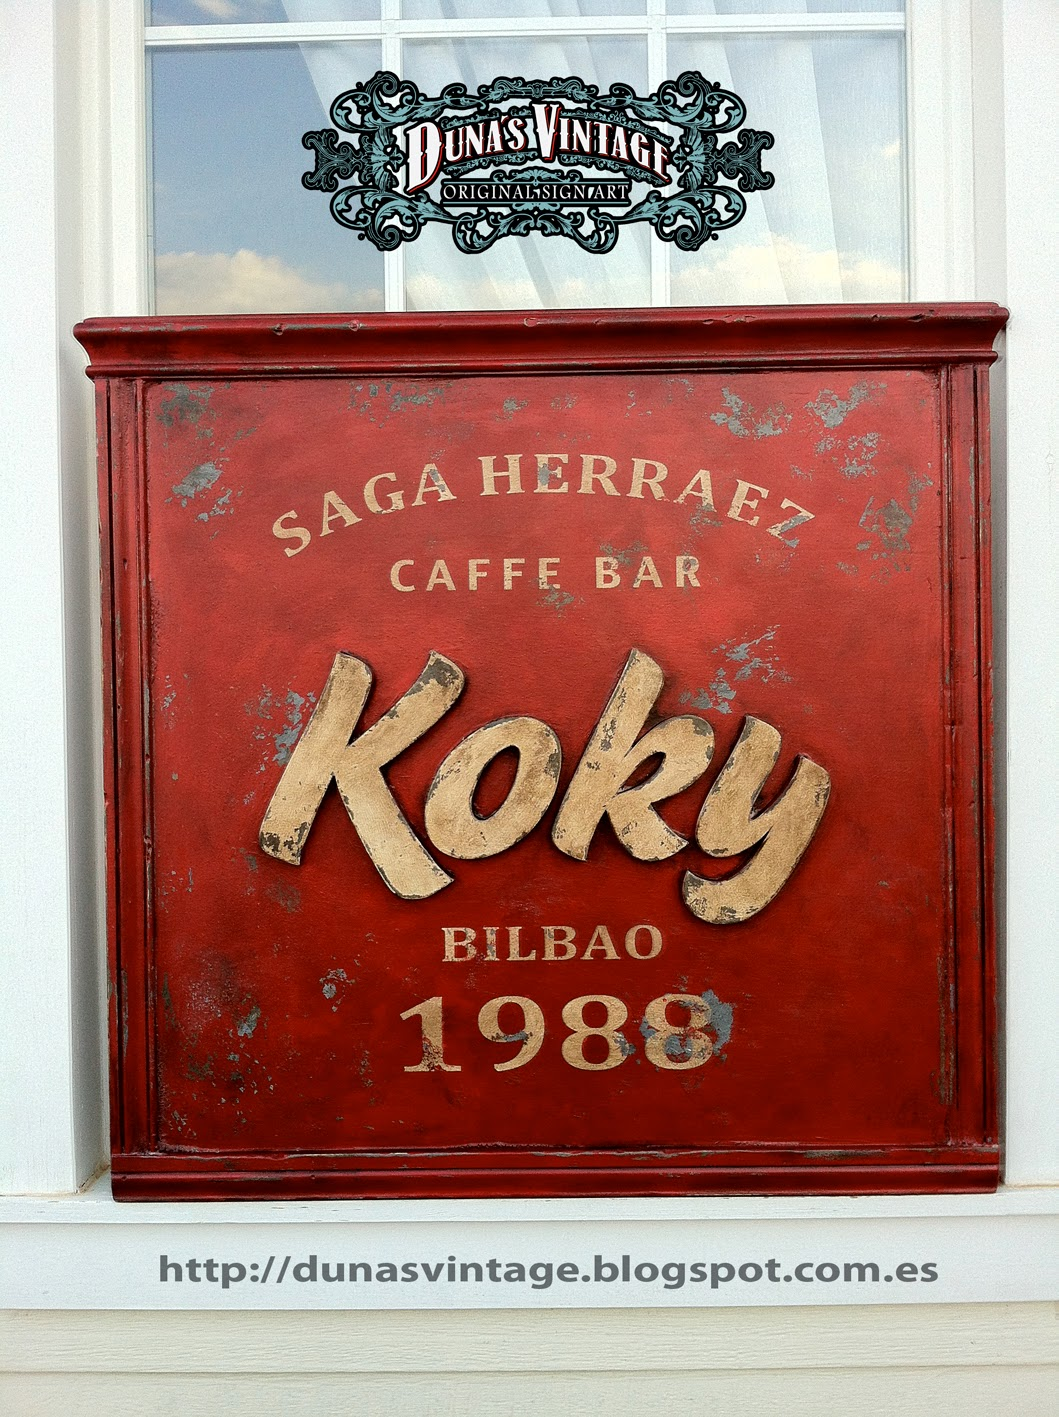 Duna s vintage koky caffe bar bilbao duna s vintage - Carteles retro ...